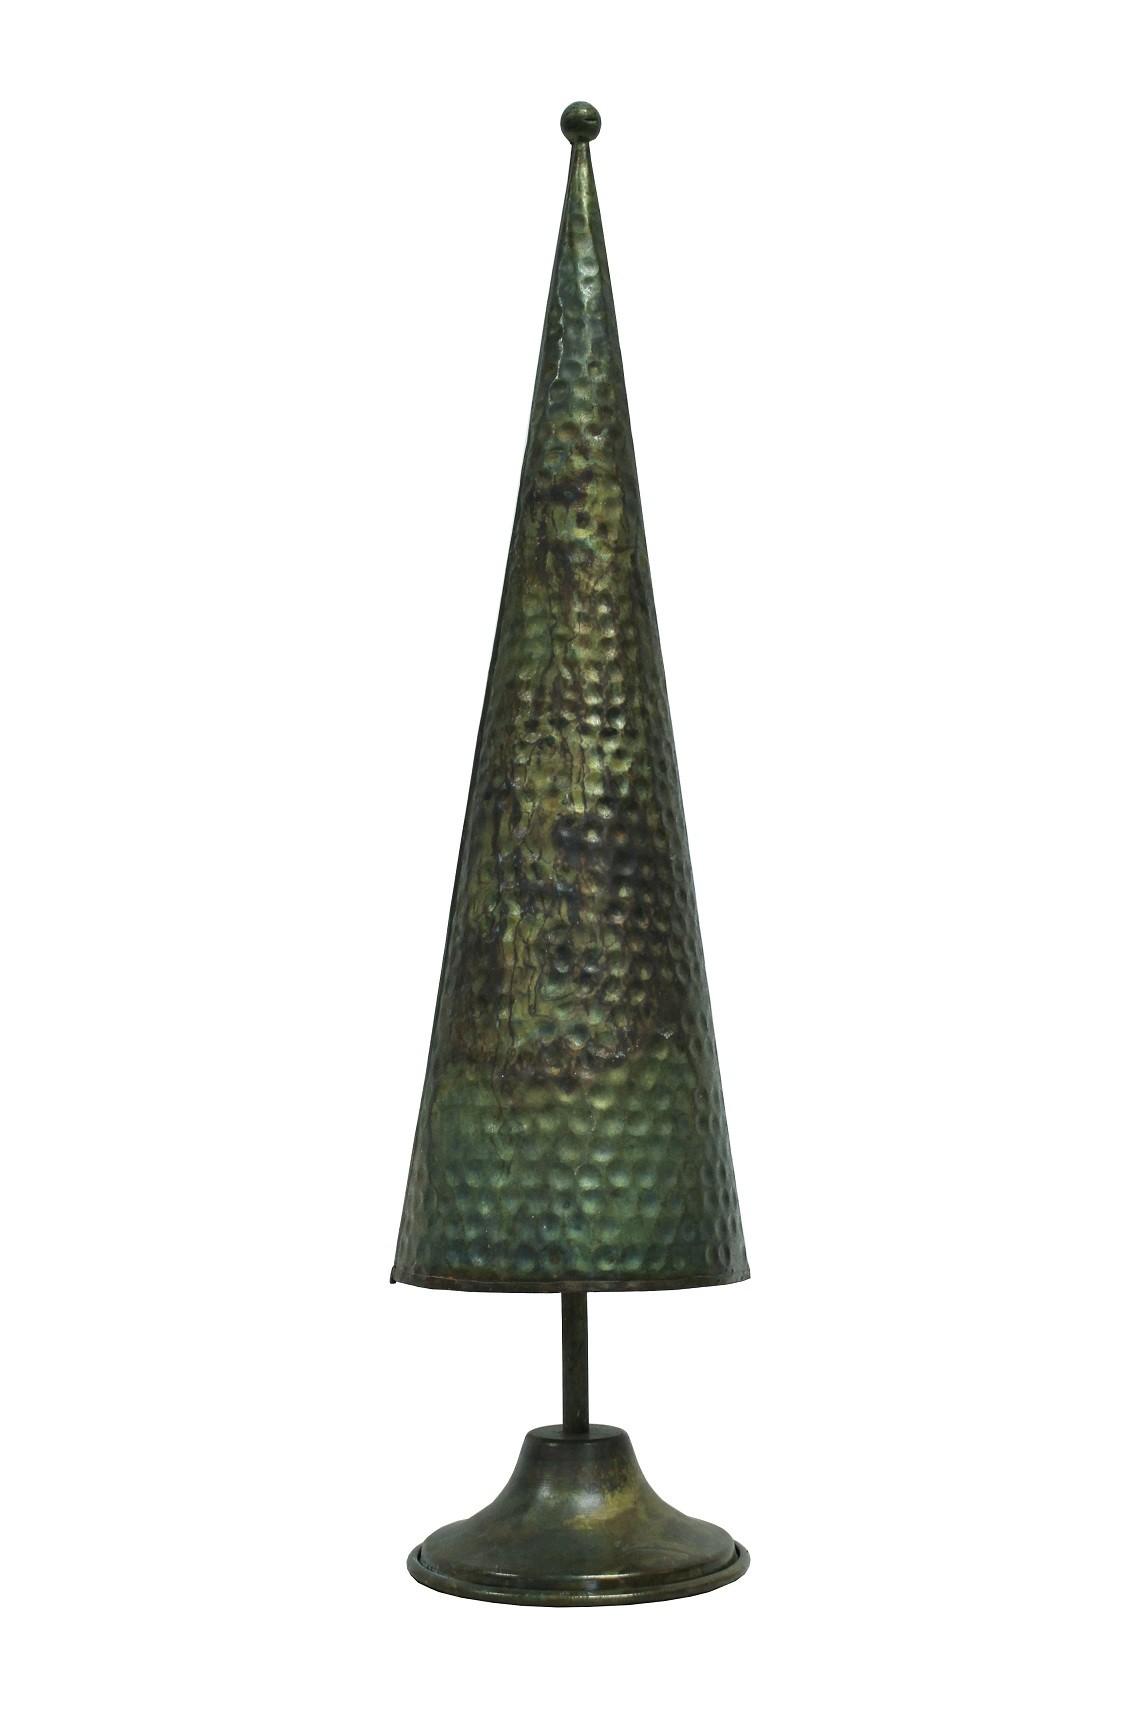 deko tannenbaum kegle optik gr n gold klein vollwaren. Black Bedroom Furniture Sets. Home Design Ideas